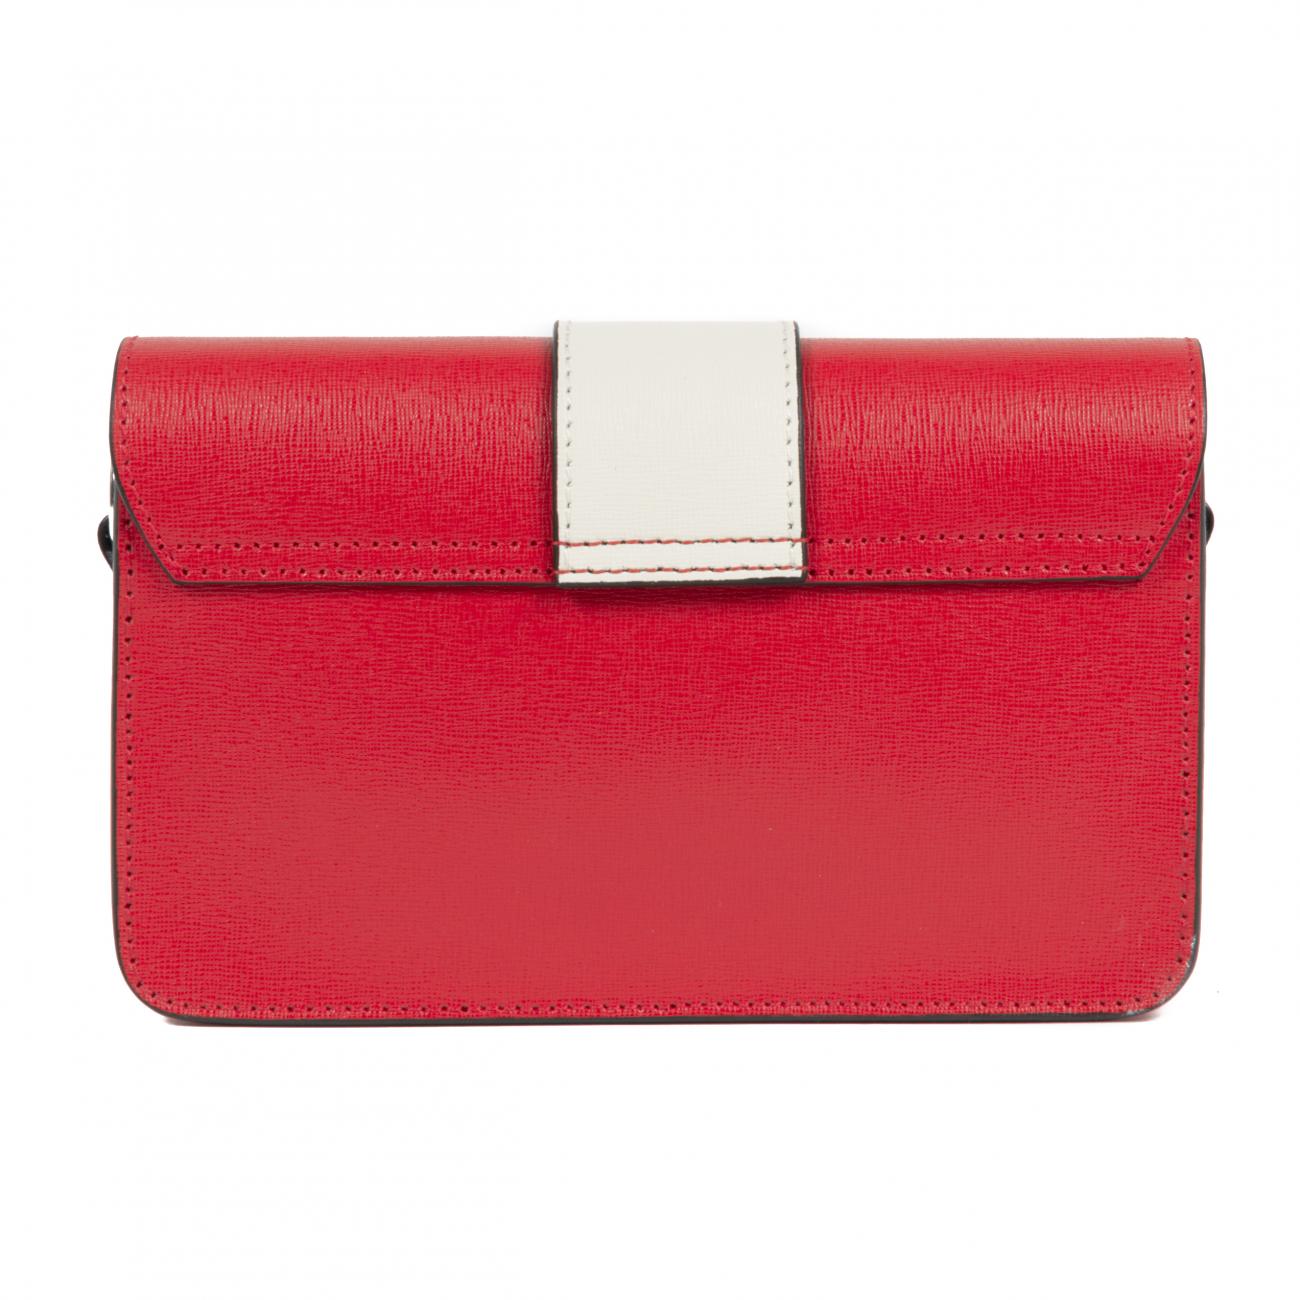 Dee Ocleppo Womens Handbag MB009 SAFFIANO ROSSO